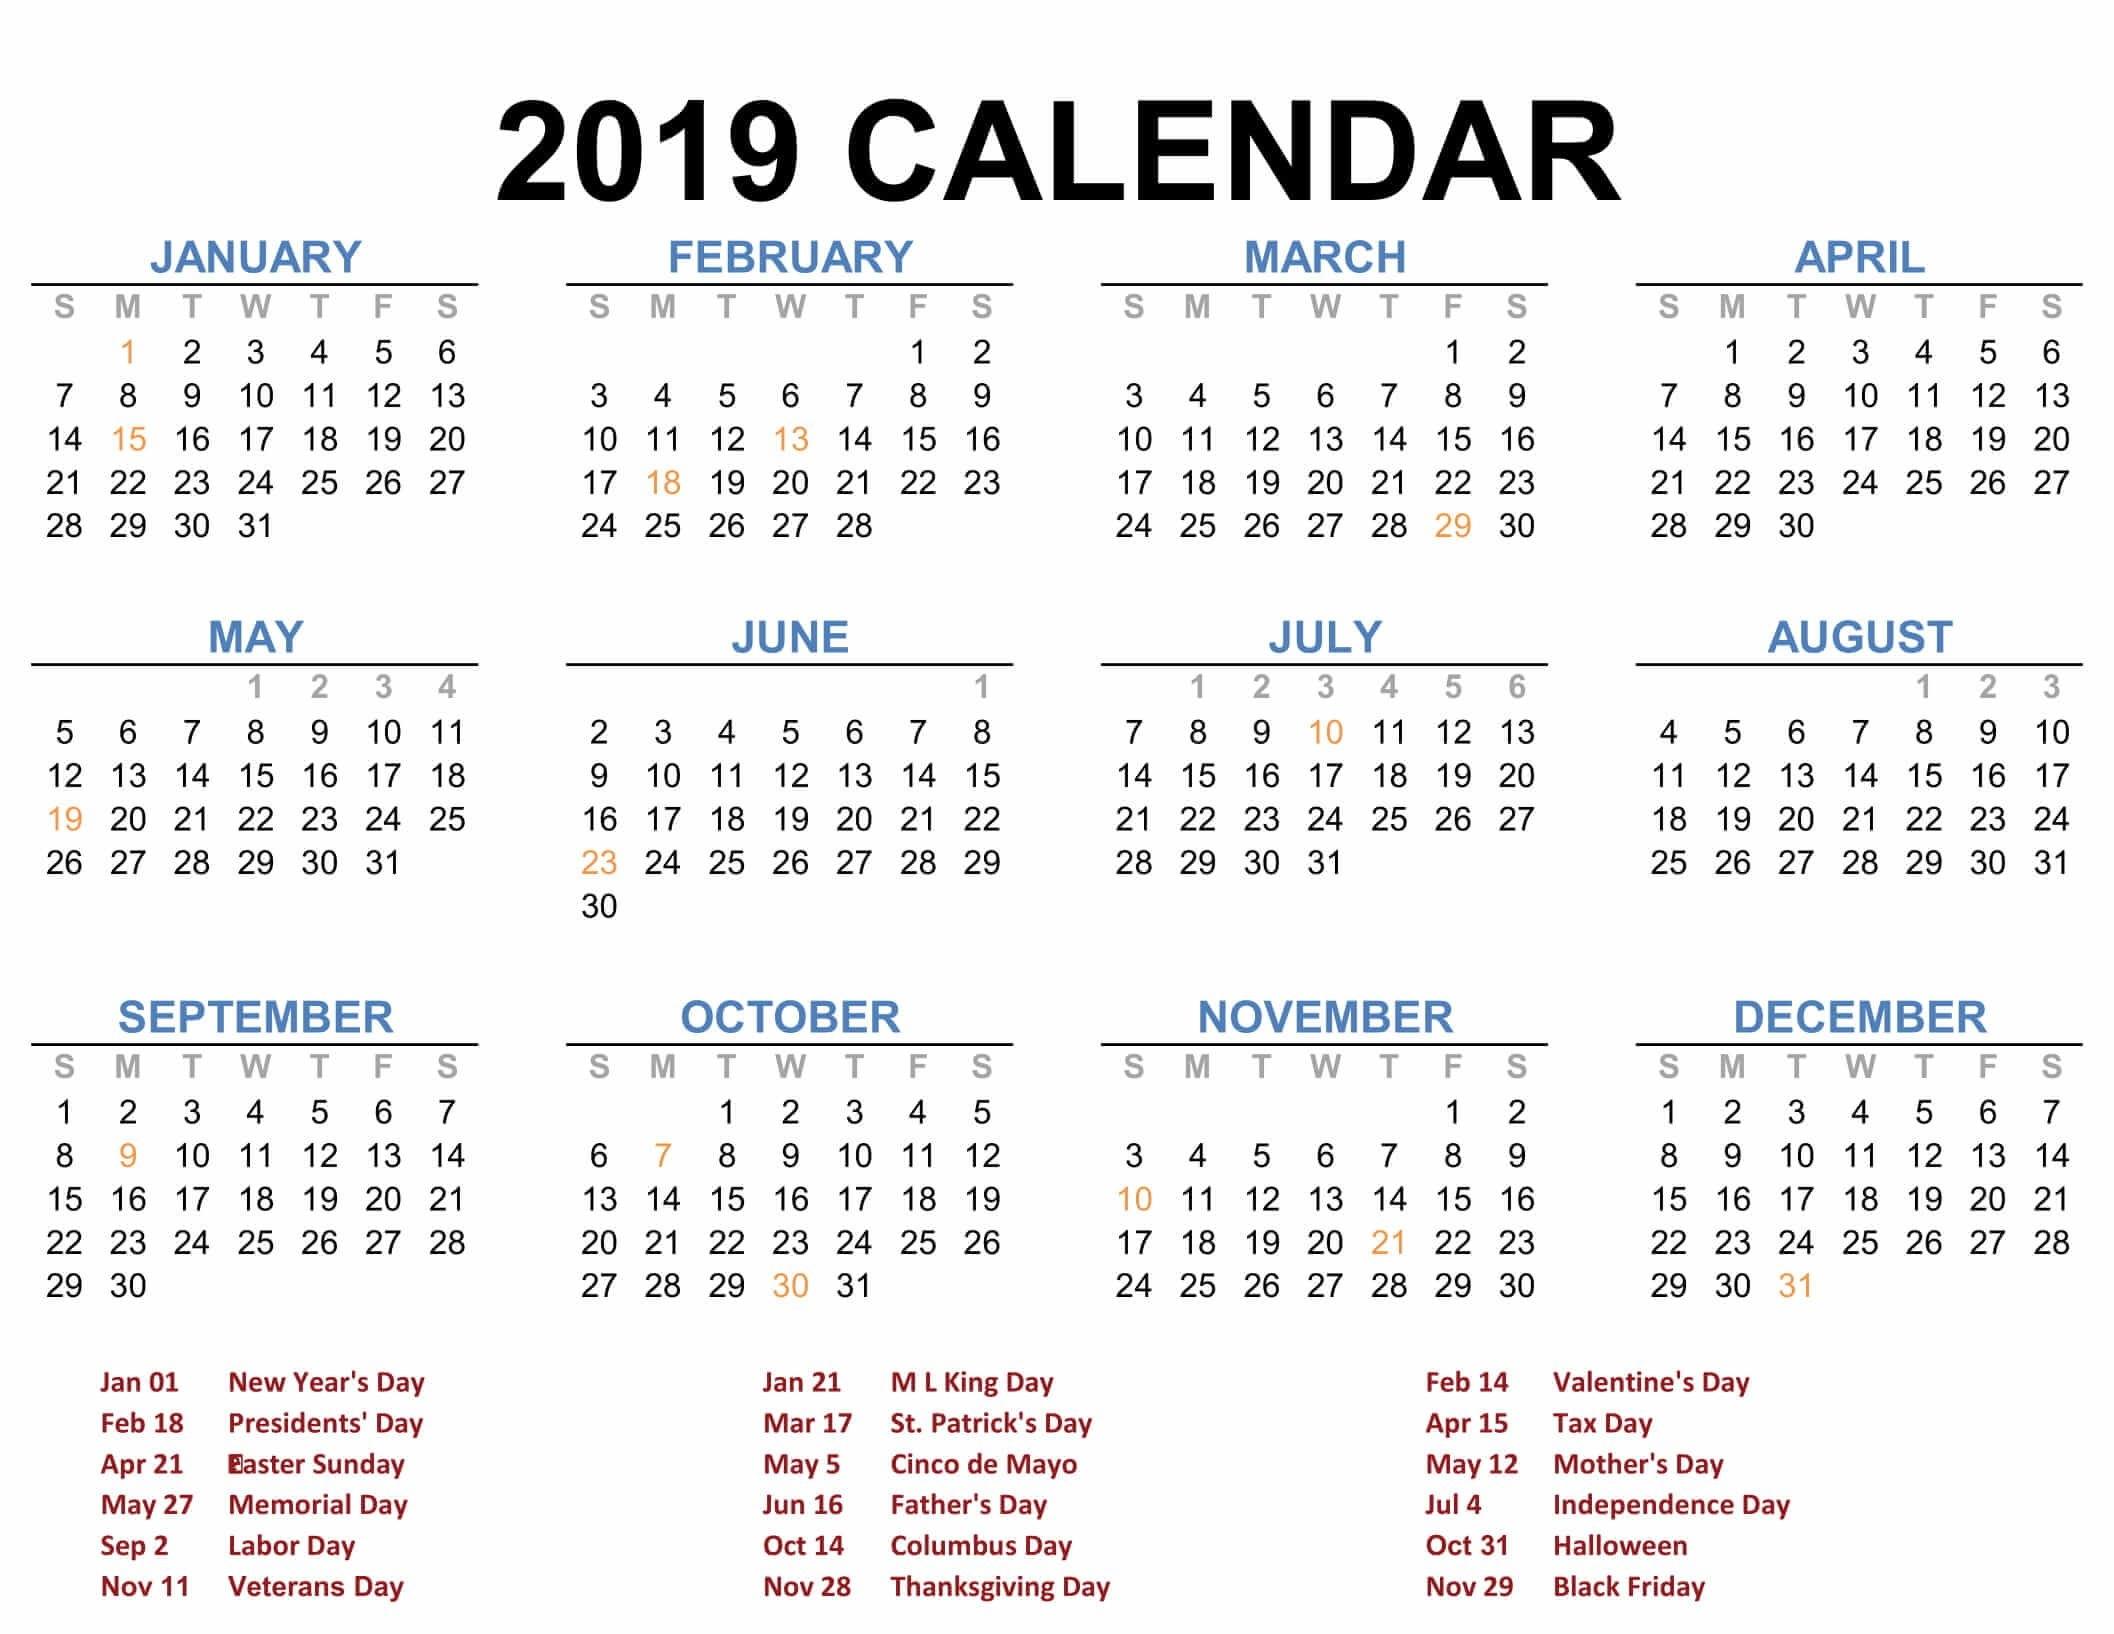 Printable Blank 2019 Calendar Templates - Calenndar Calendar 4 2019